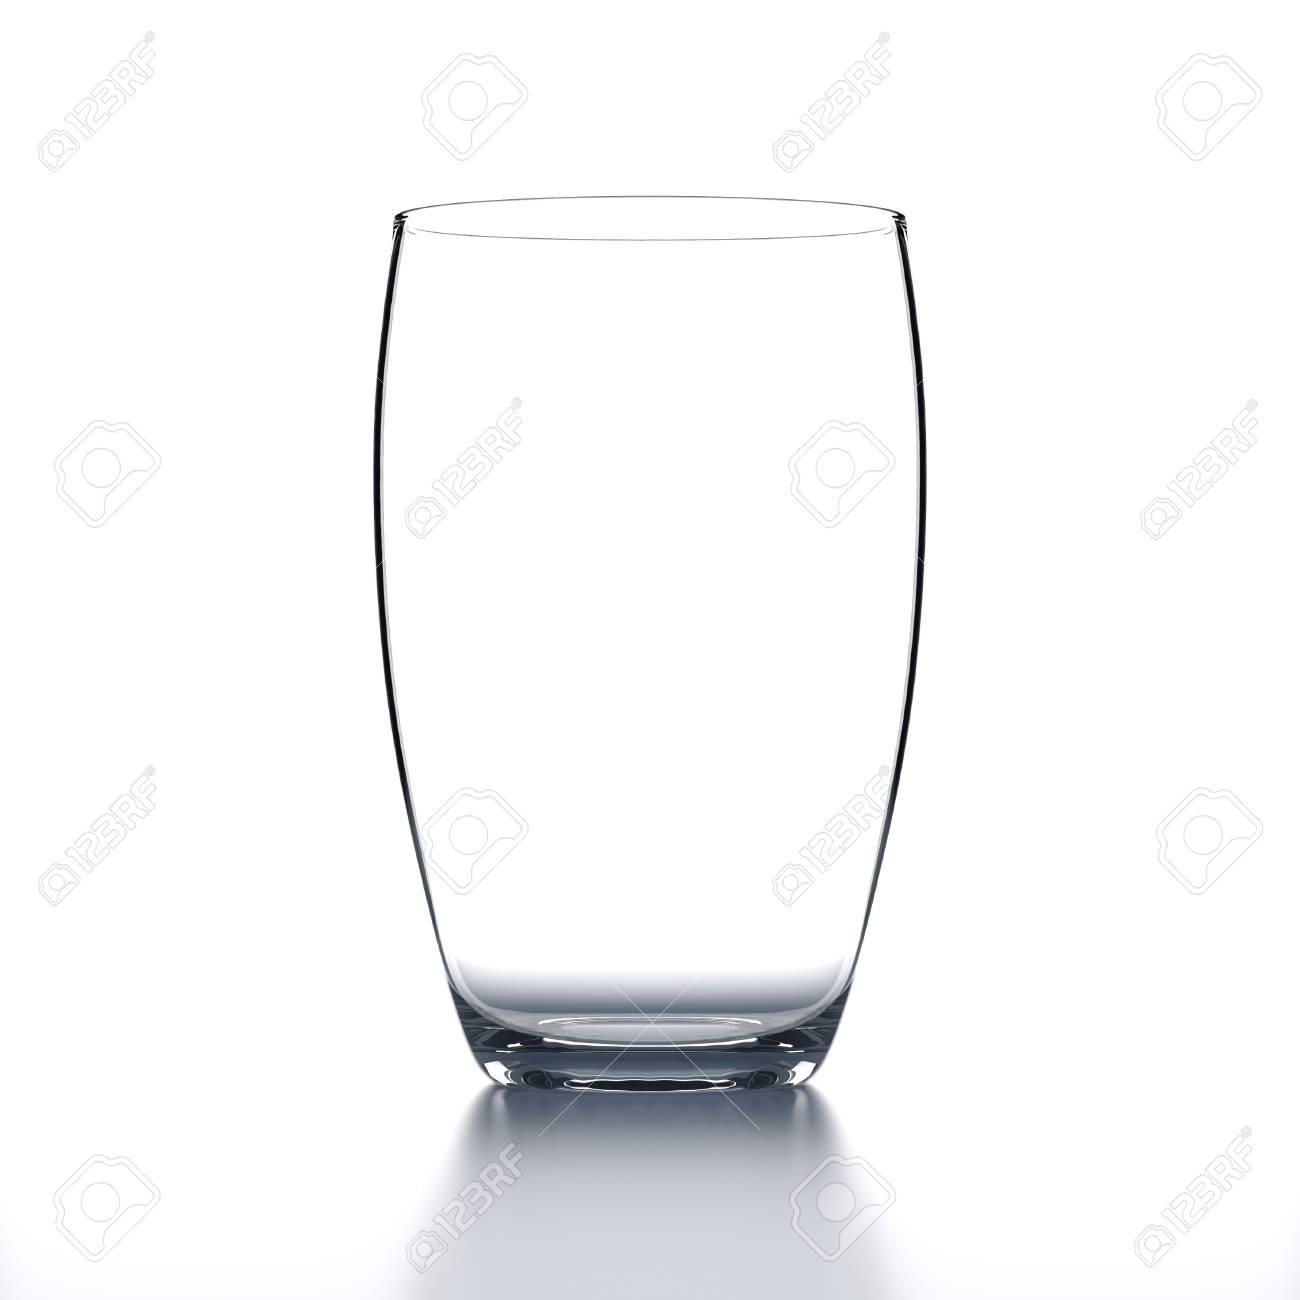 6b2aad5aadc Full Water Glass on black background. Drinking glassware. 3D illustration.  Stock Illustration -